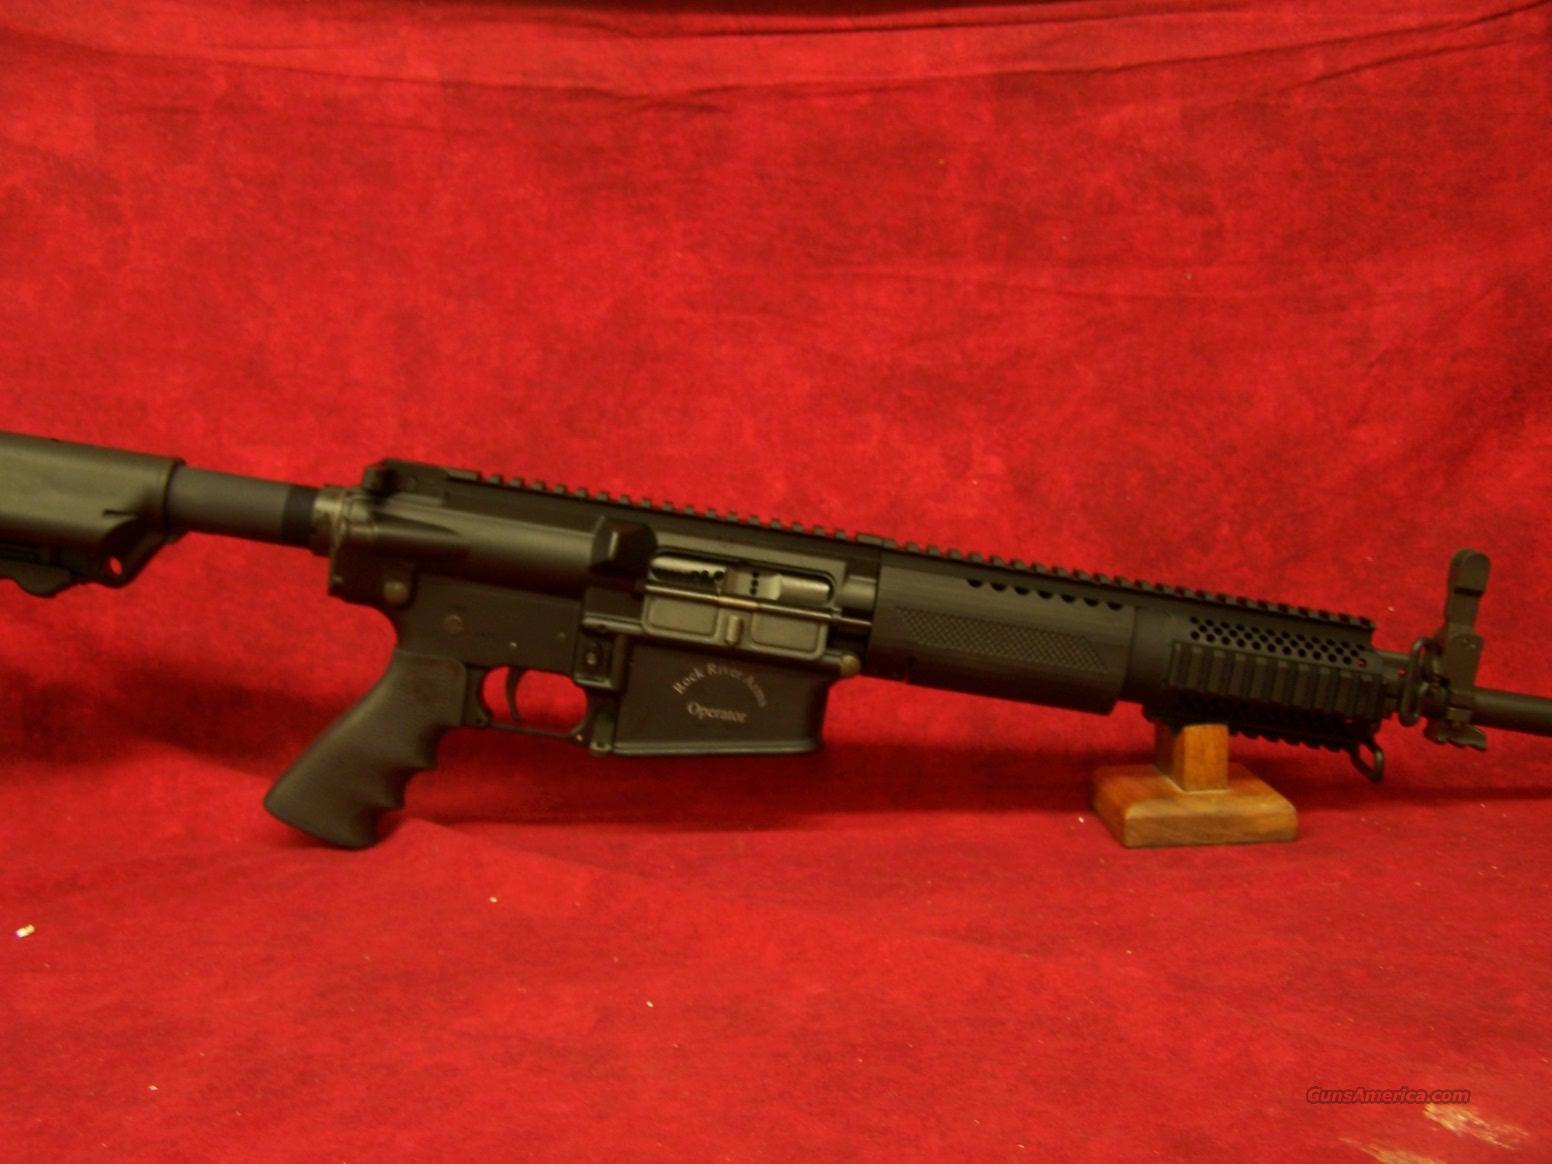 Rock River Arms LAR-8 Elite Operator .308/7.62mm  Guns > Rifles > Rock River Arms Rifles